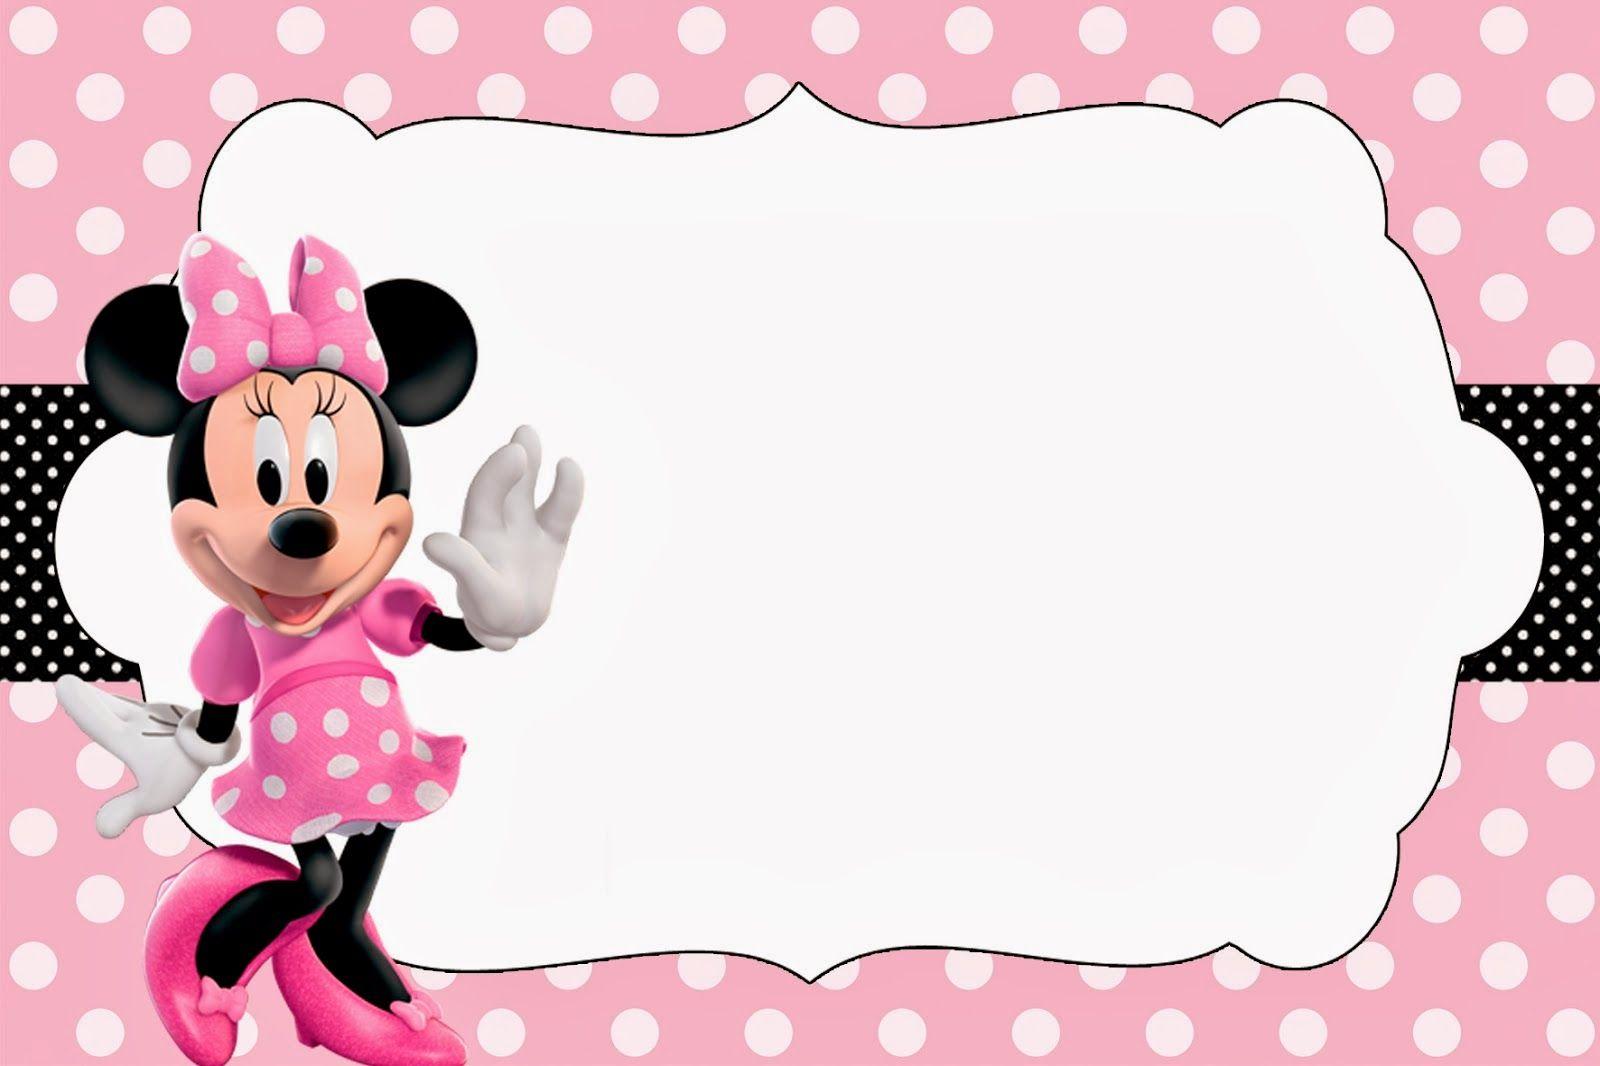 Mickey Mouse Photo Invitation with perfect invitations design